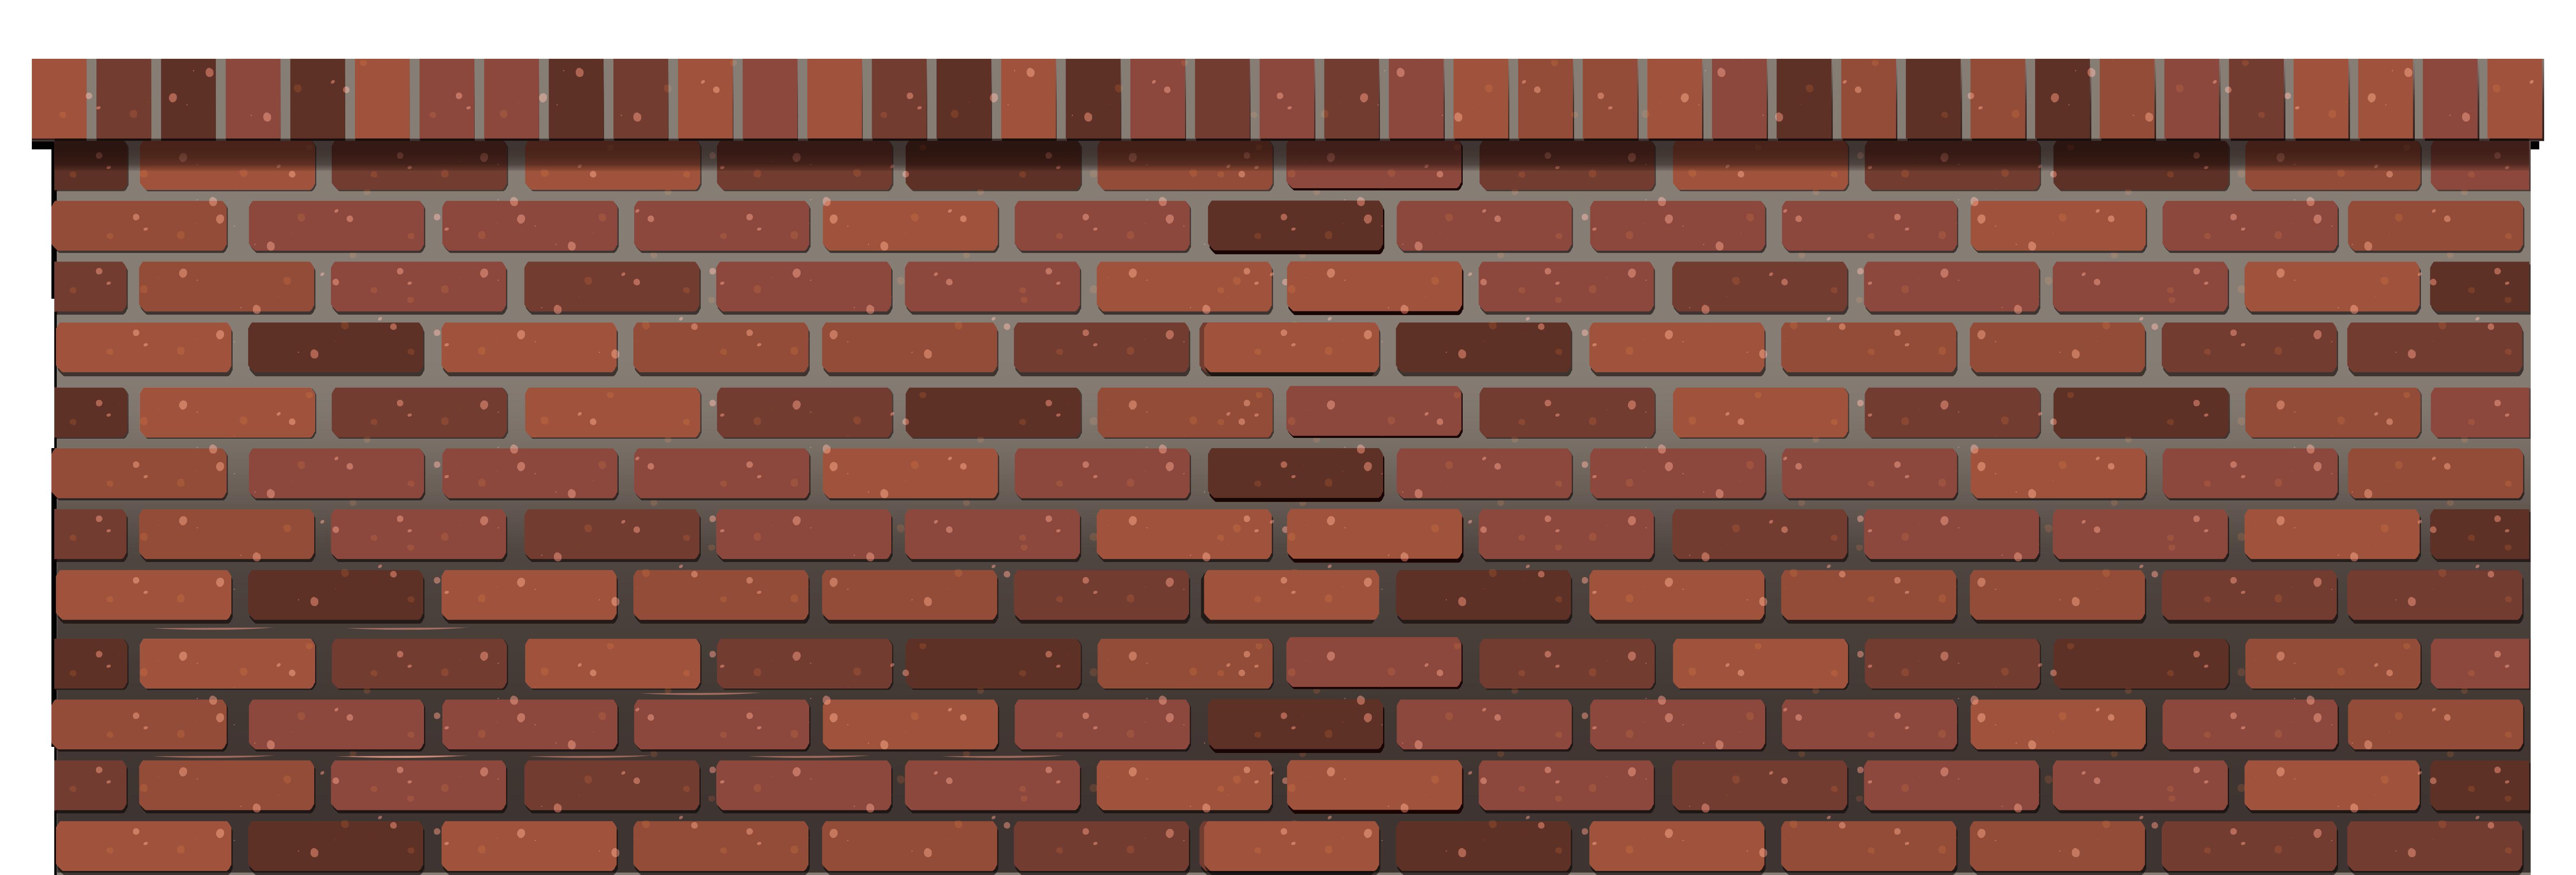 Brick PNG - 2419